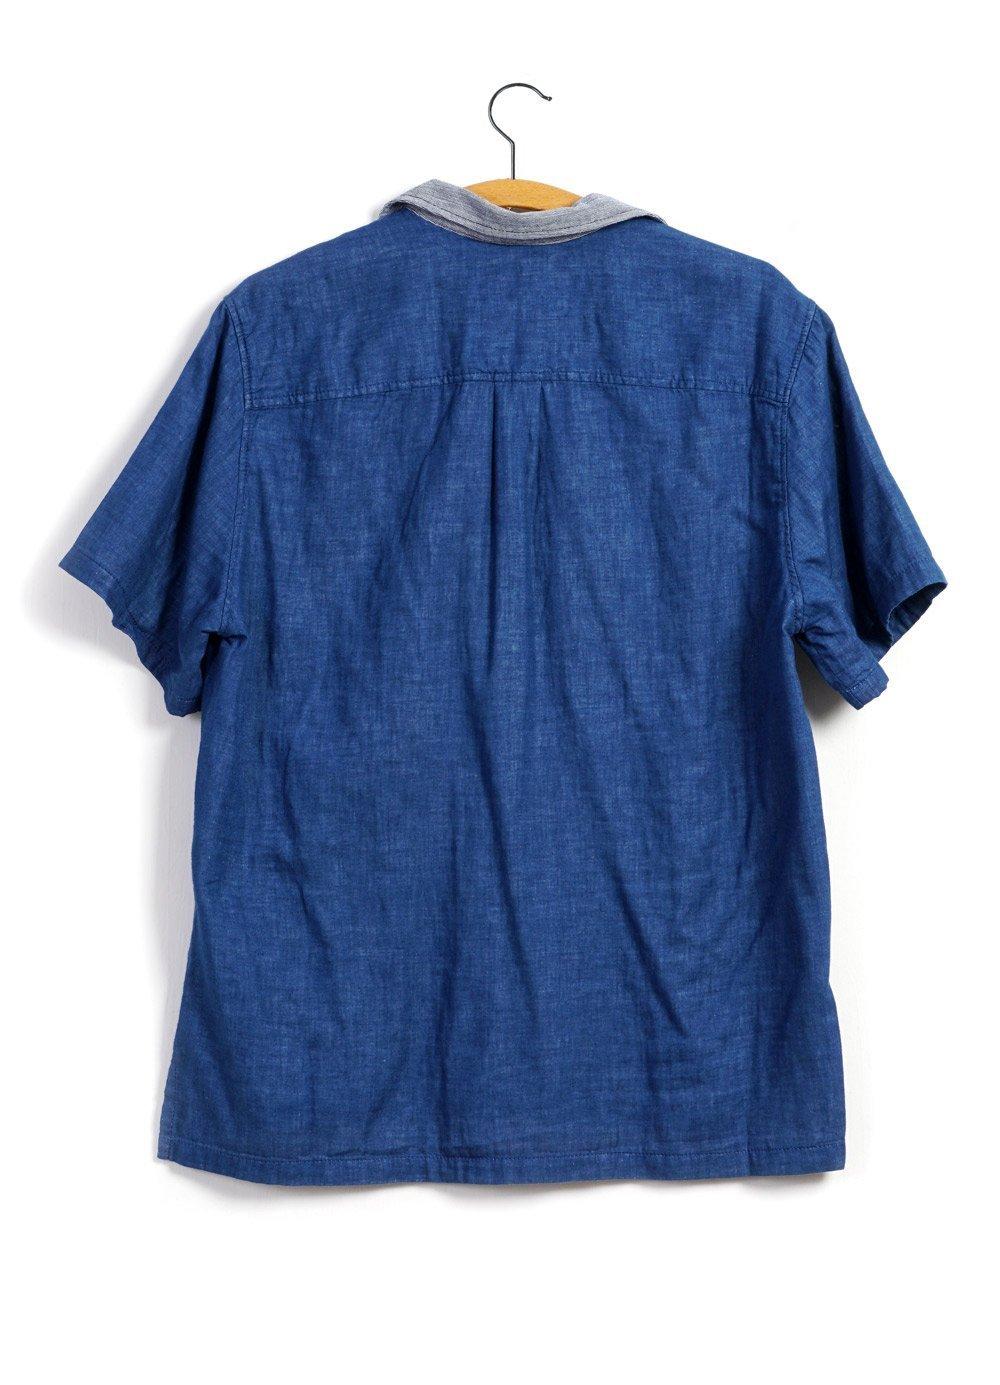 Hansen Garments PHILLIP | Short Sleeve Pull-On Shirt | flower/navy, indigo/stripe